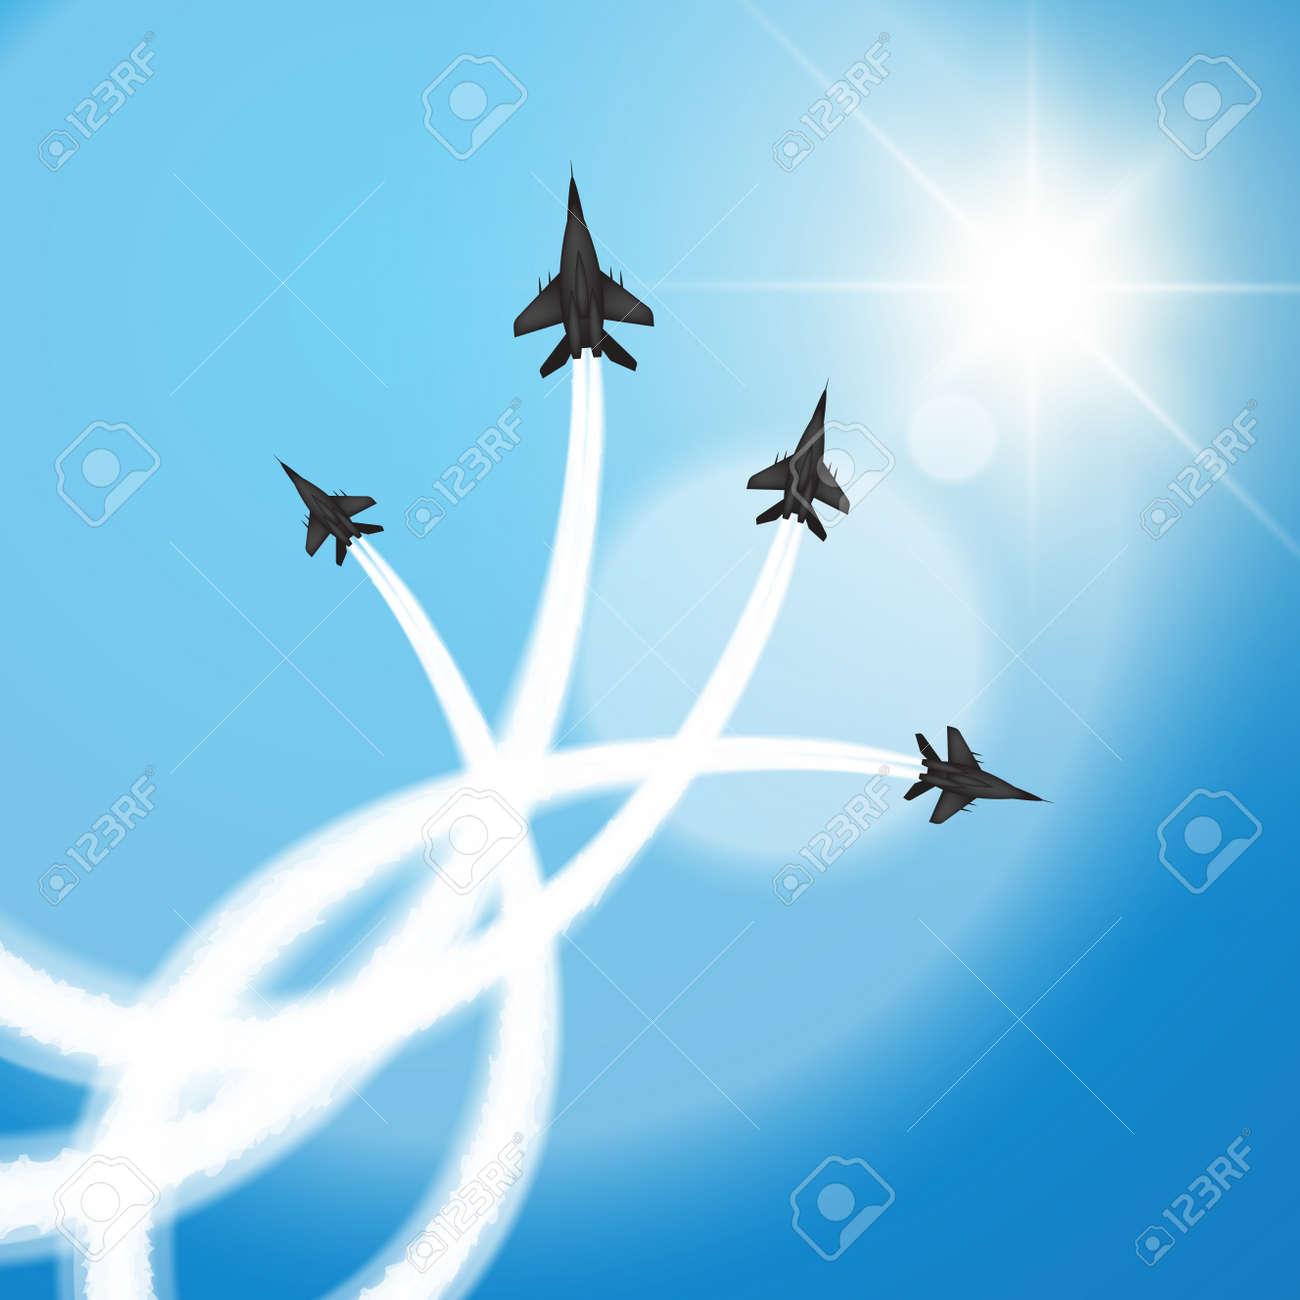 Military fighter jets perform aerial acrobatics. Vector illustration - 43870507